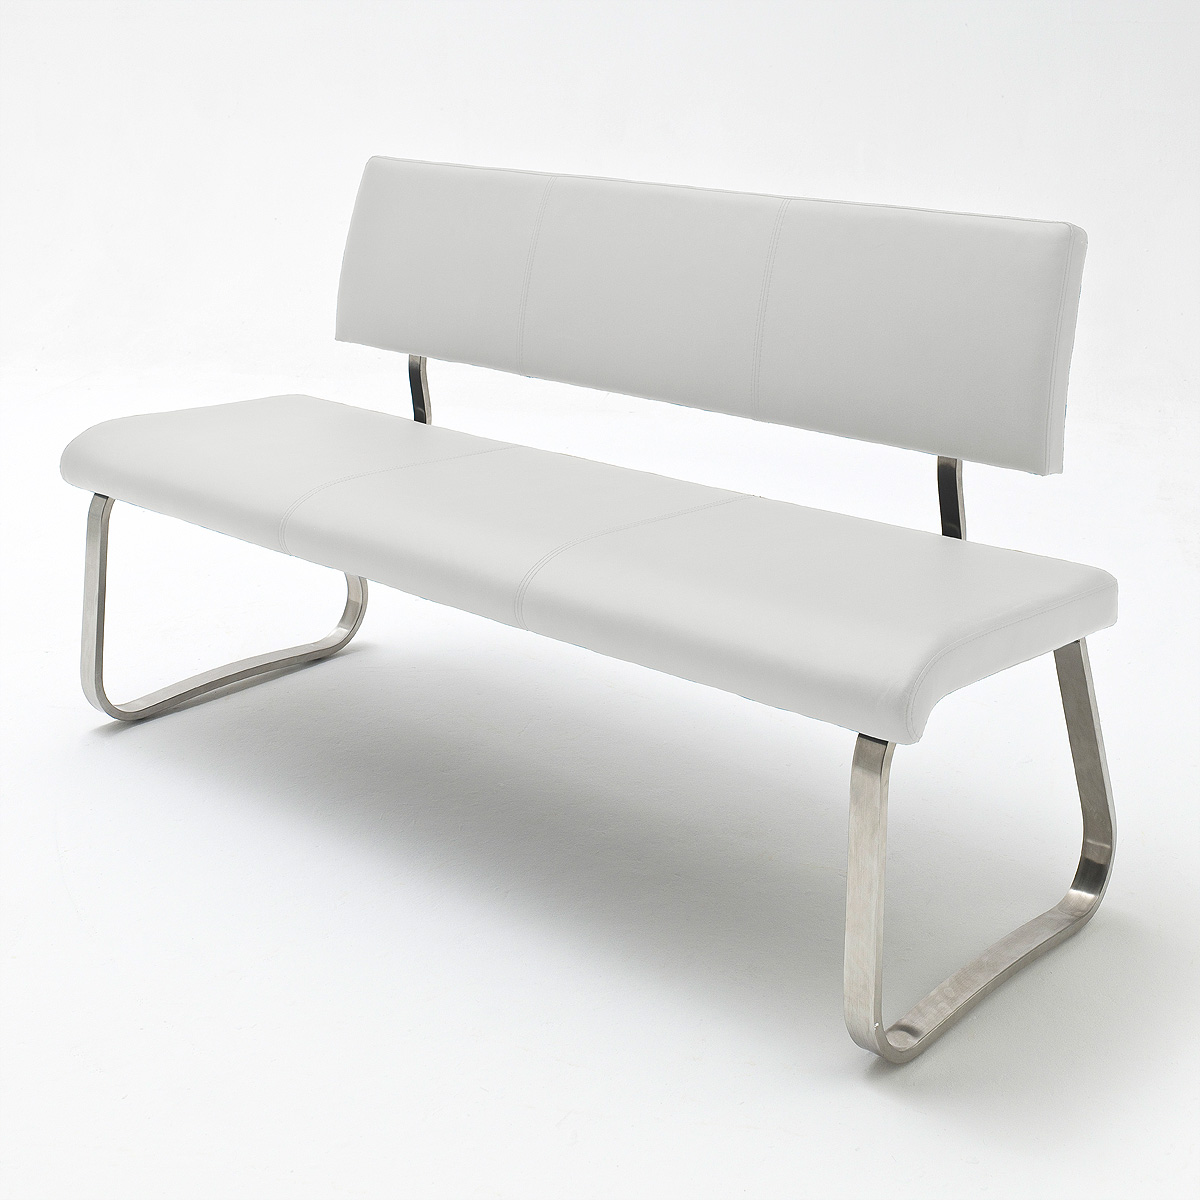 bank arco sitzbank polsterbank braun grau cappuccino schwarz wei auswahl ebay. Black Bedroom Furniture Sets. Home Design Ideas